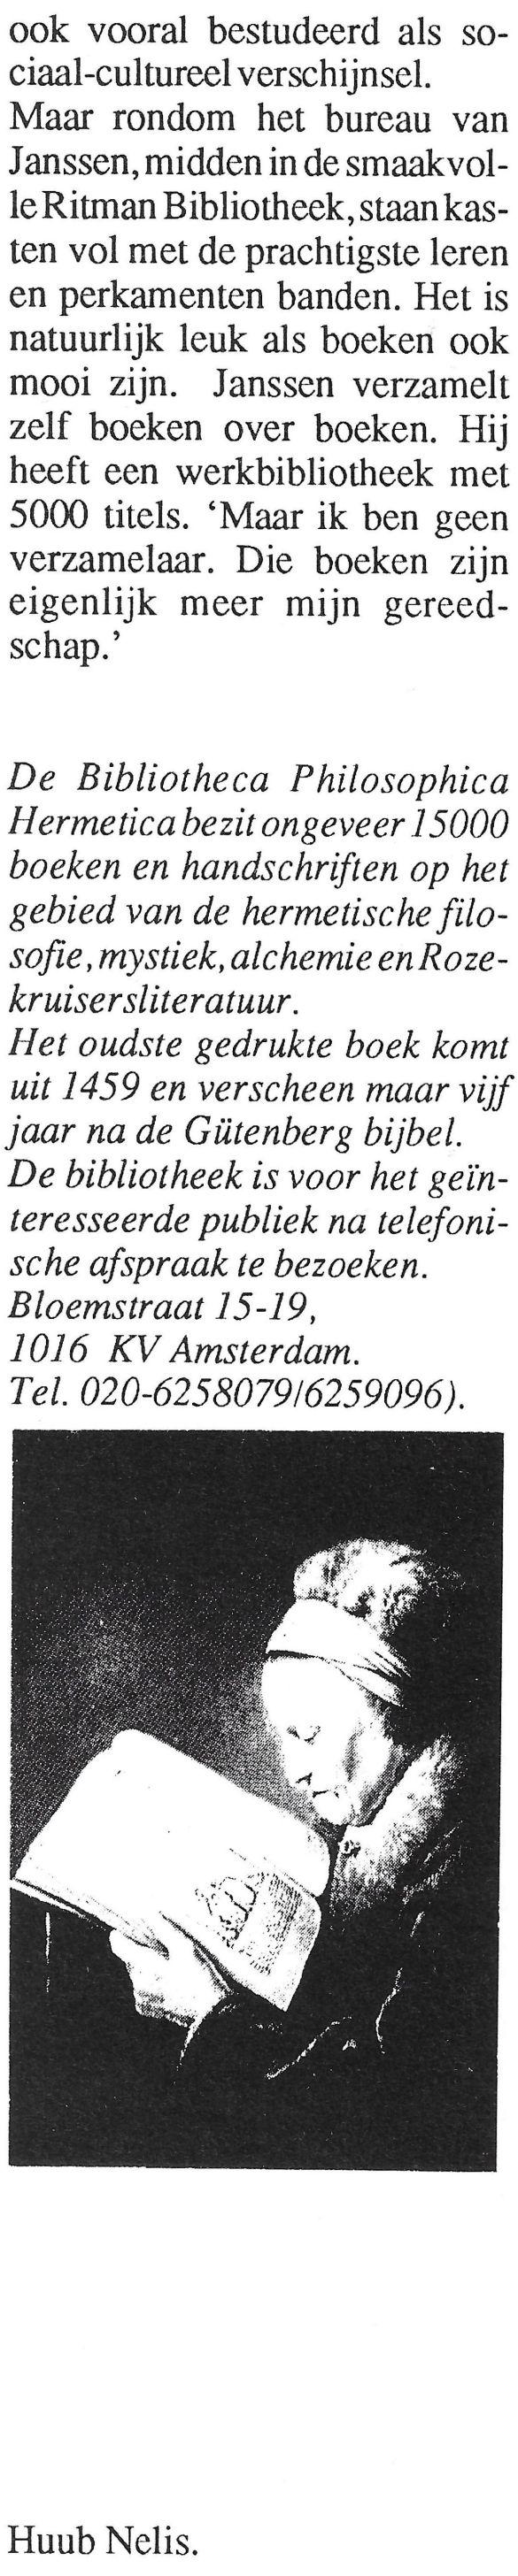 BoekenpostEersteJaargangNummer2NovDec1992 11Kolom9